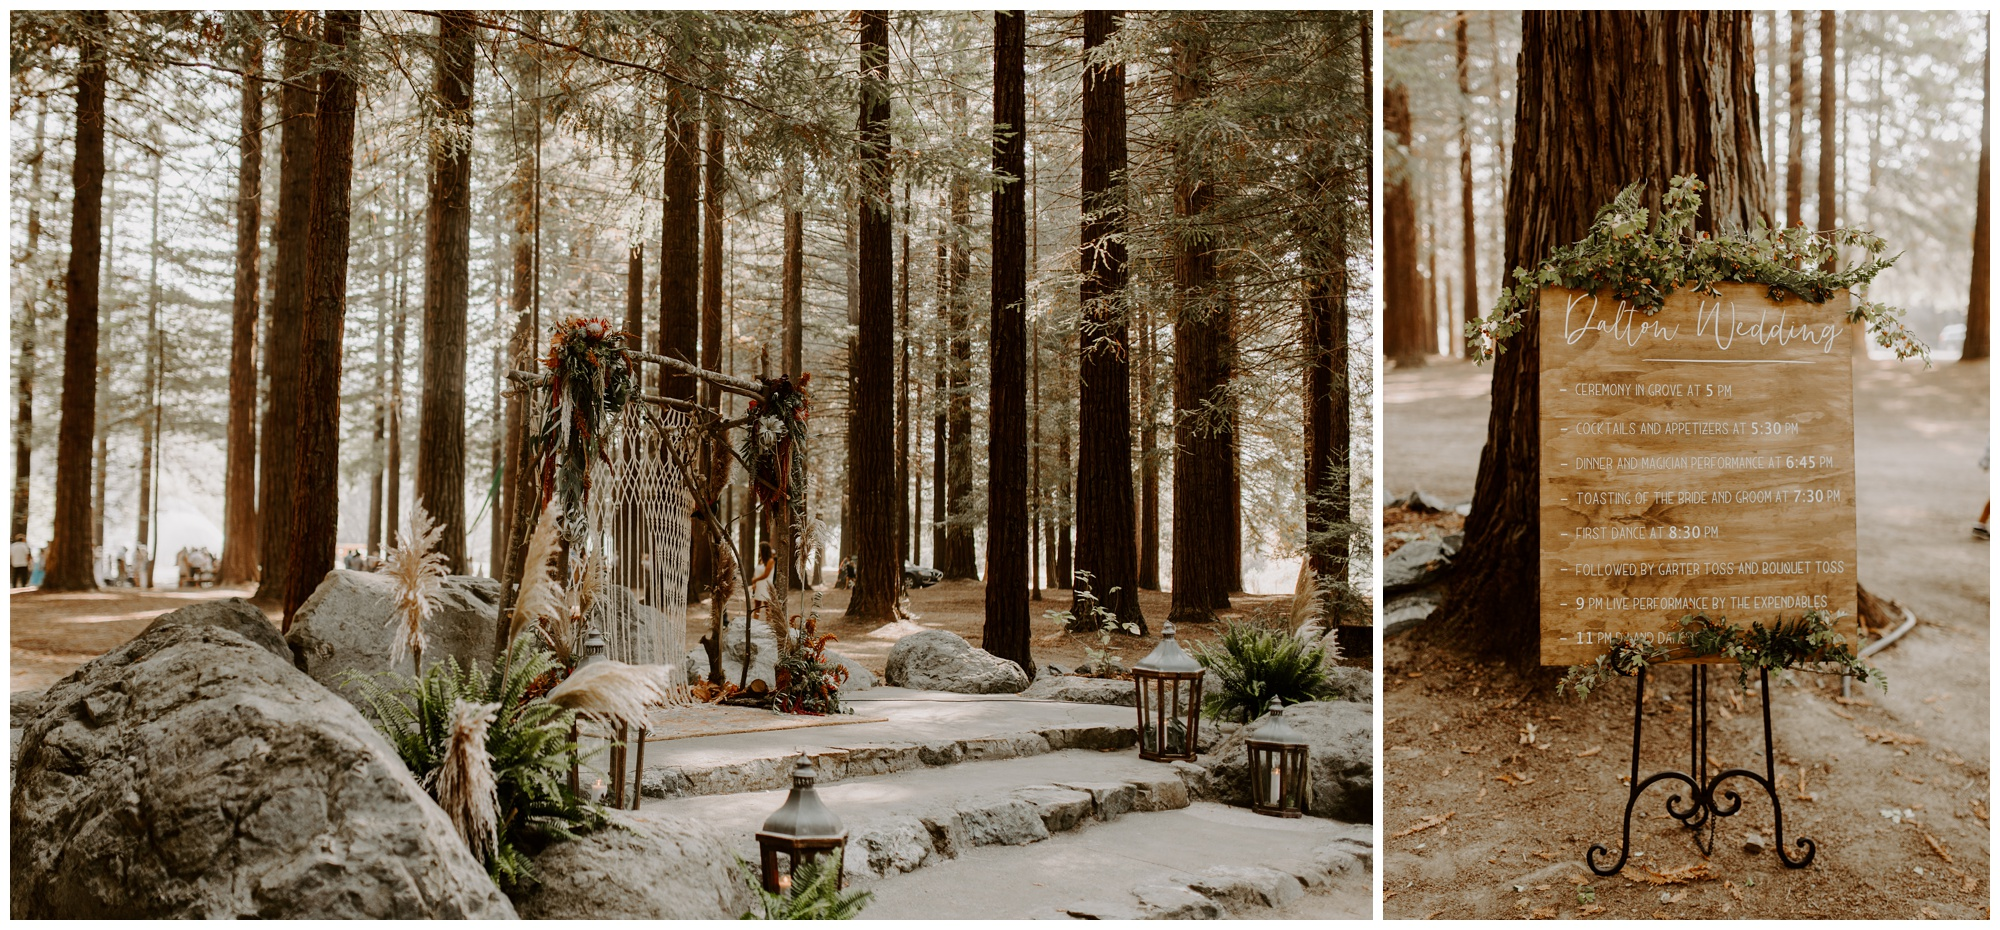 Redwood Festival Wedding Humbolt California - Jessica Heron Images_0025.jpg